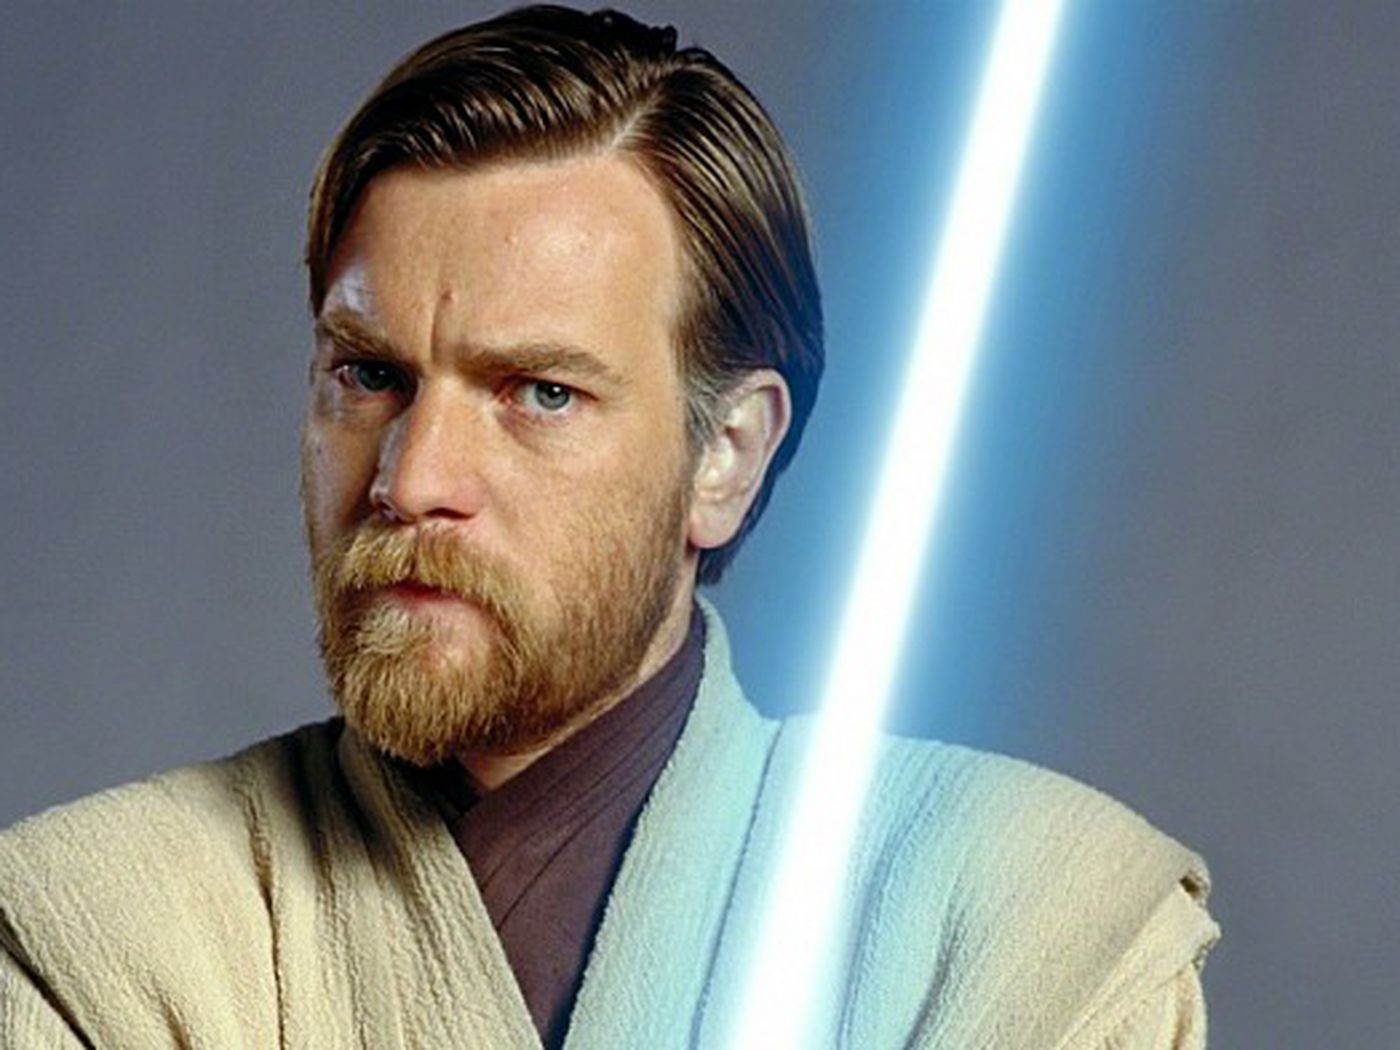 Disney Confirms Its Obi Wan Kenobi Series Will Begin Shooting In 2020 The Verge